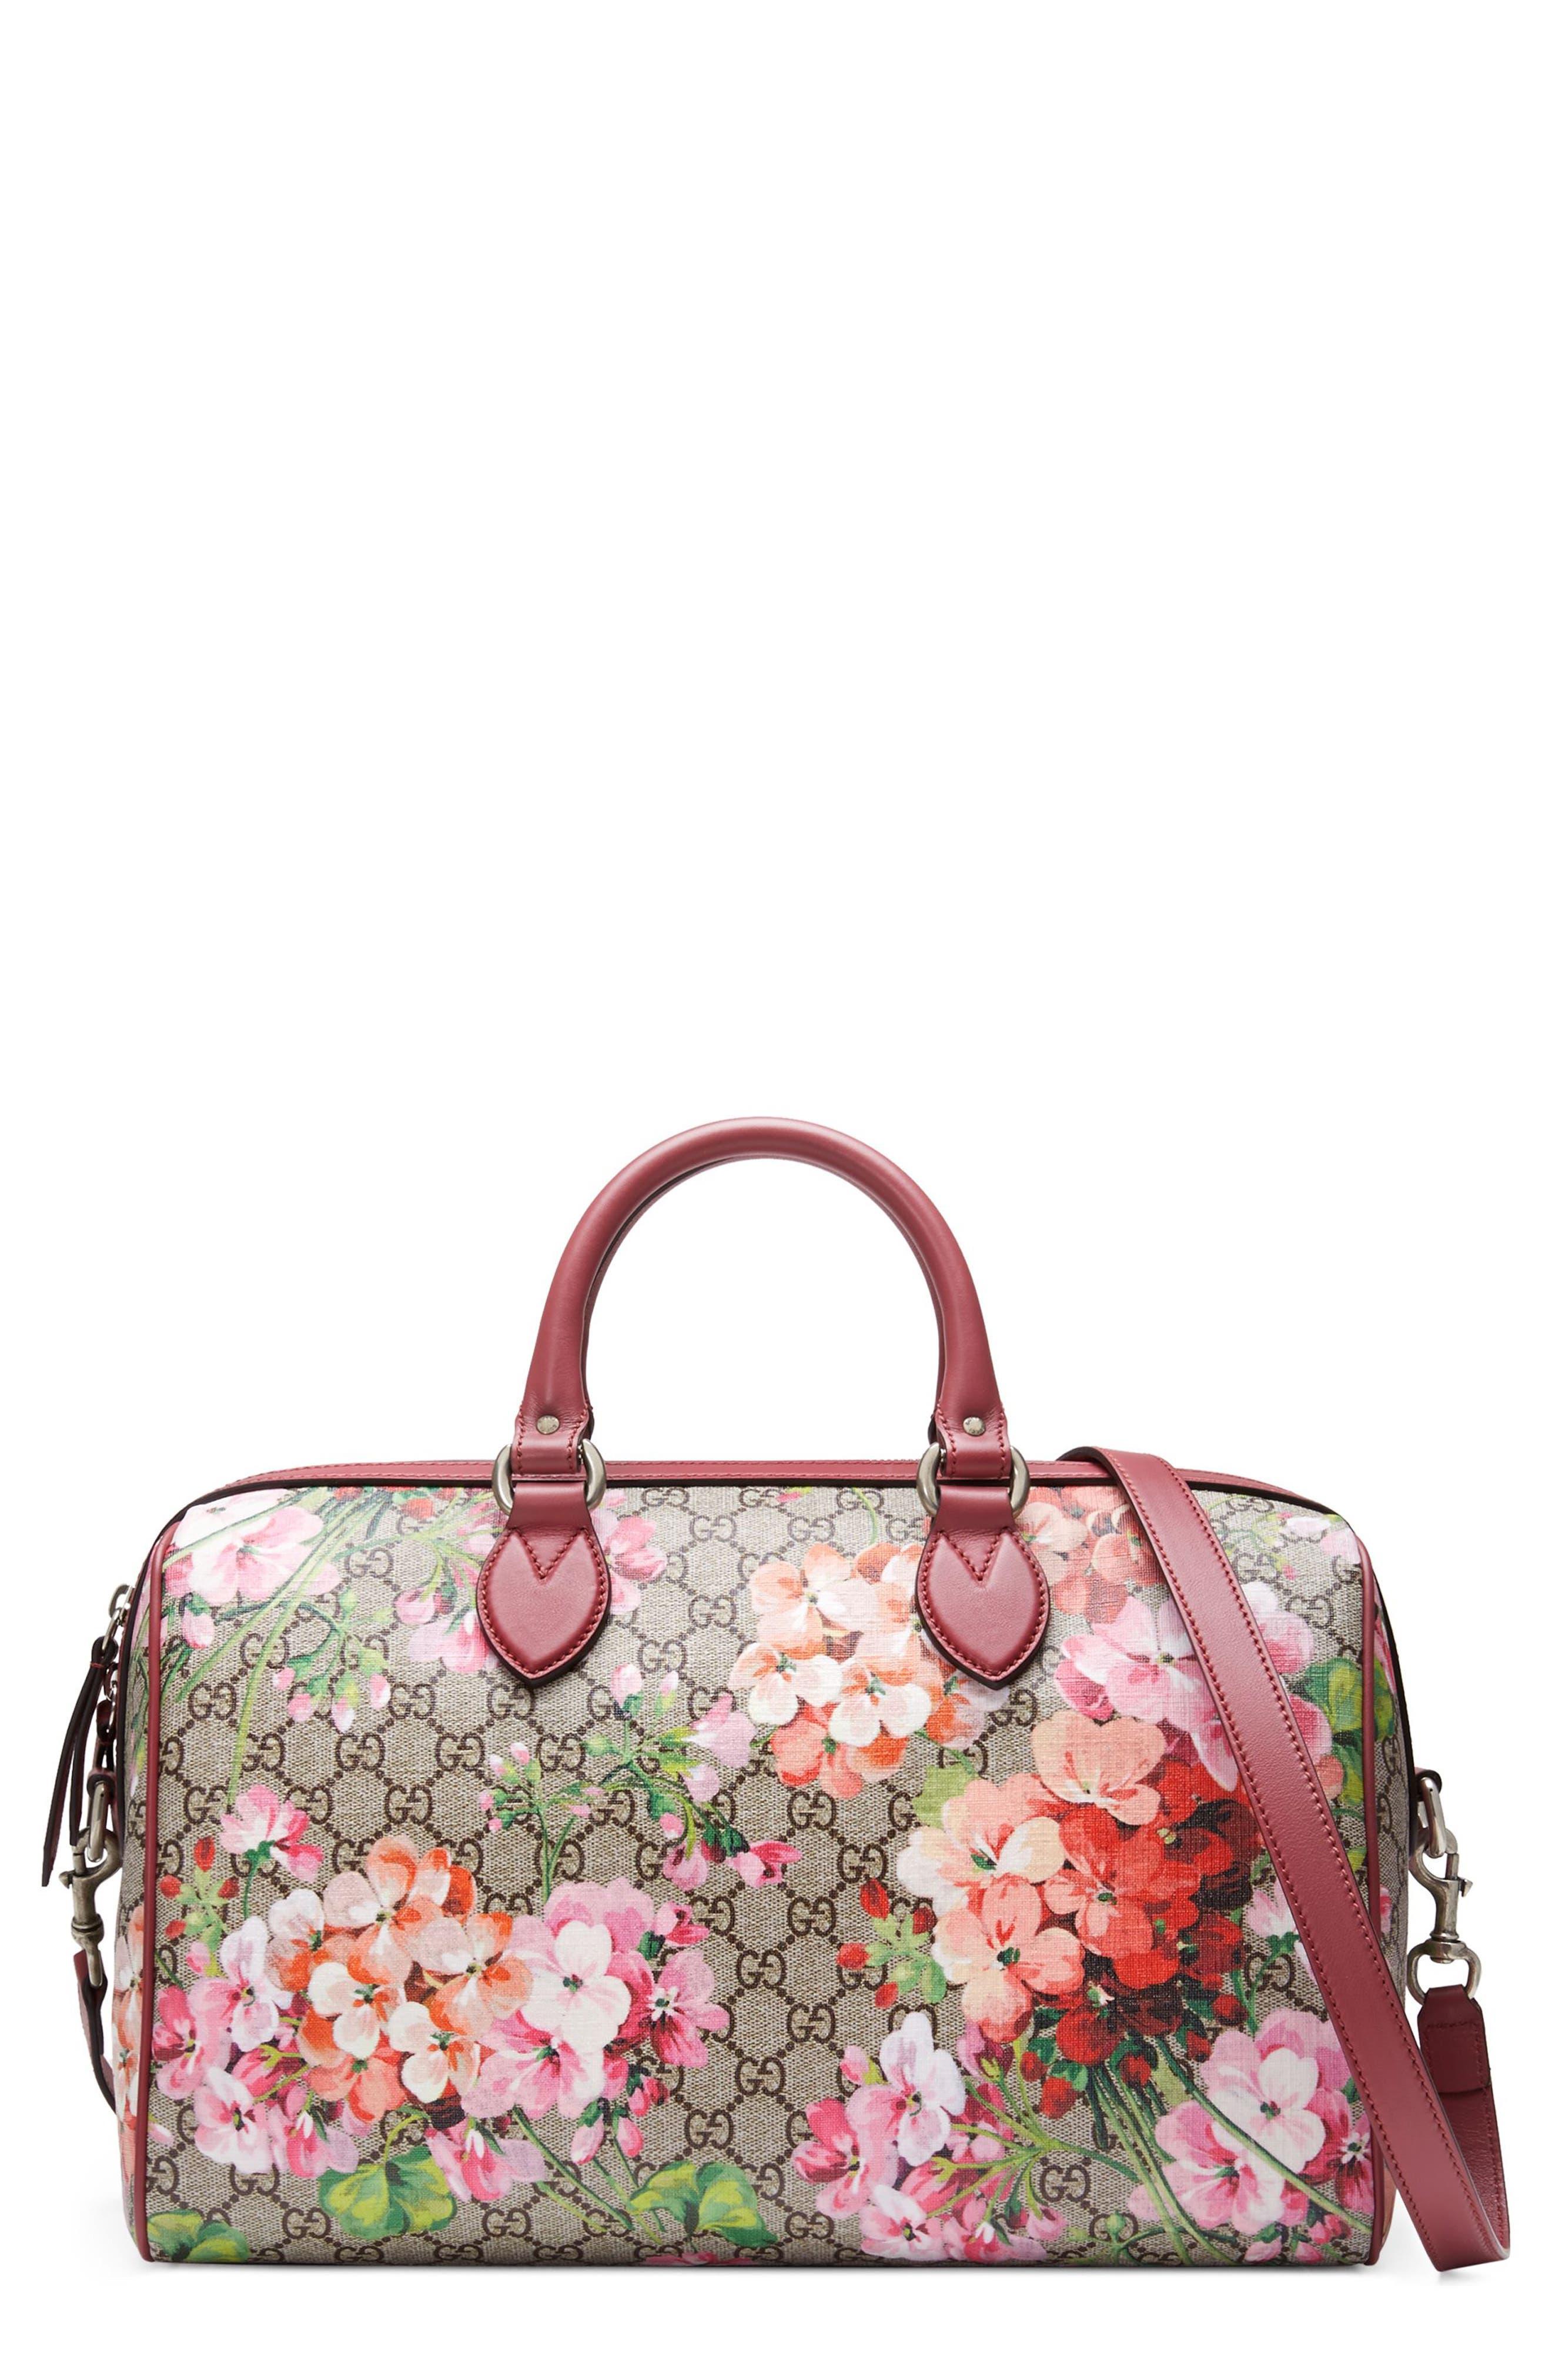 Main Image - Gucci Medium Blooms GG Supreme Top Handle Canvas Bag